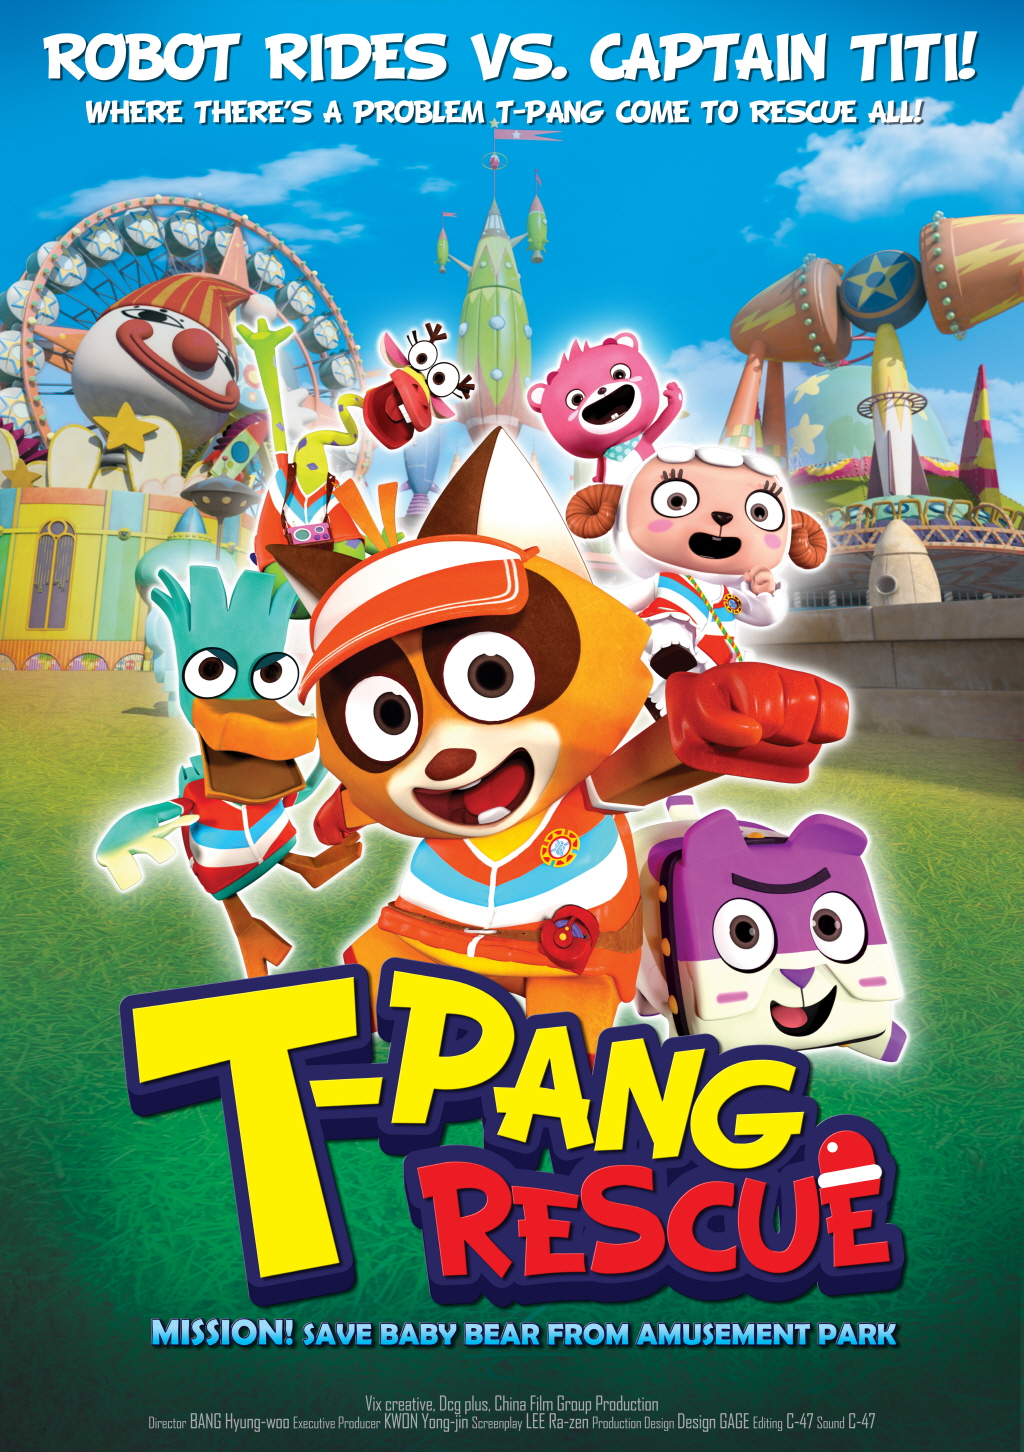 T-Pang Rescue Mission! Save Baby Bear From Amusement Park-ทีปัง หน่วยกู้ภัยจิ๋วแจ๋ว [HD][พากย์ไทย]